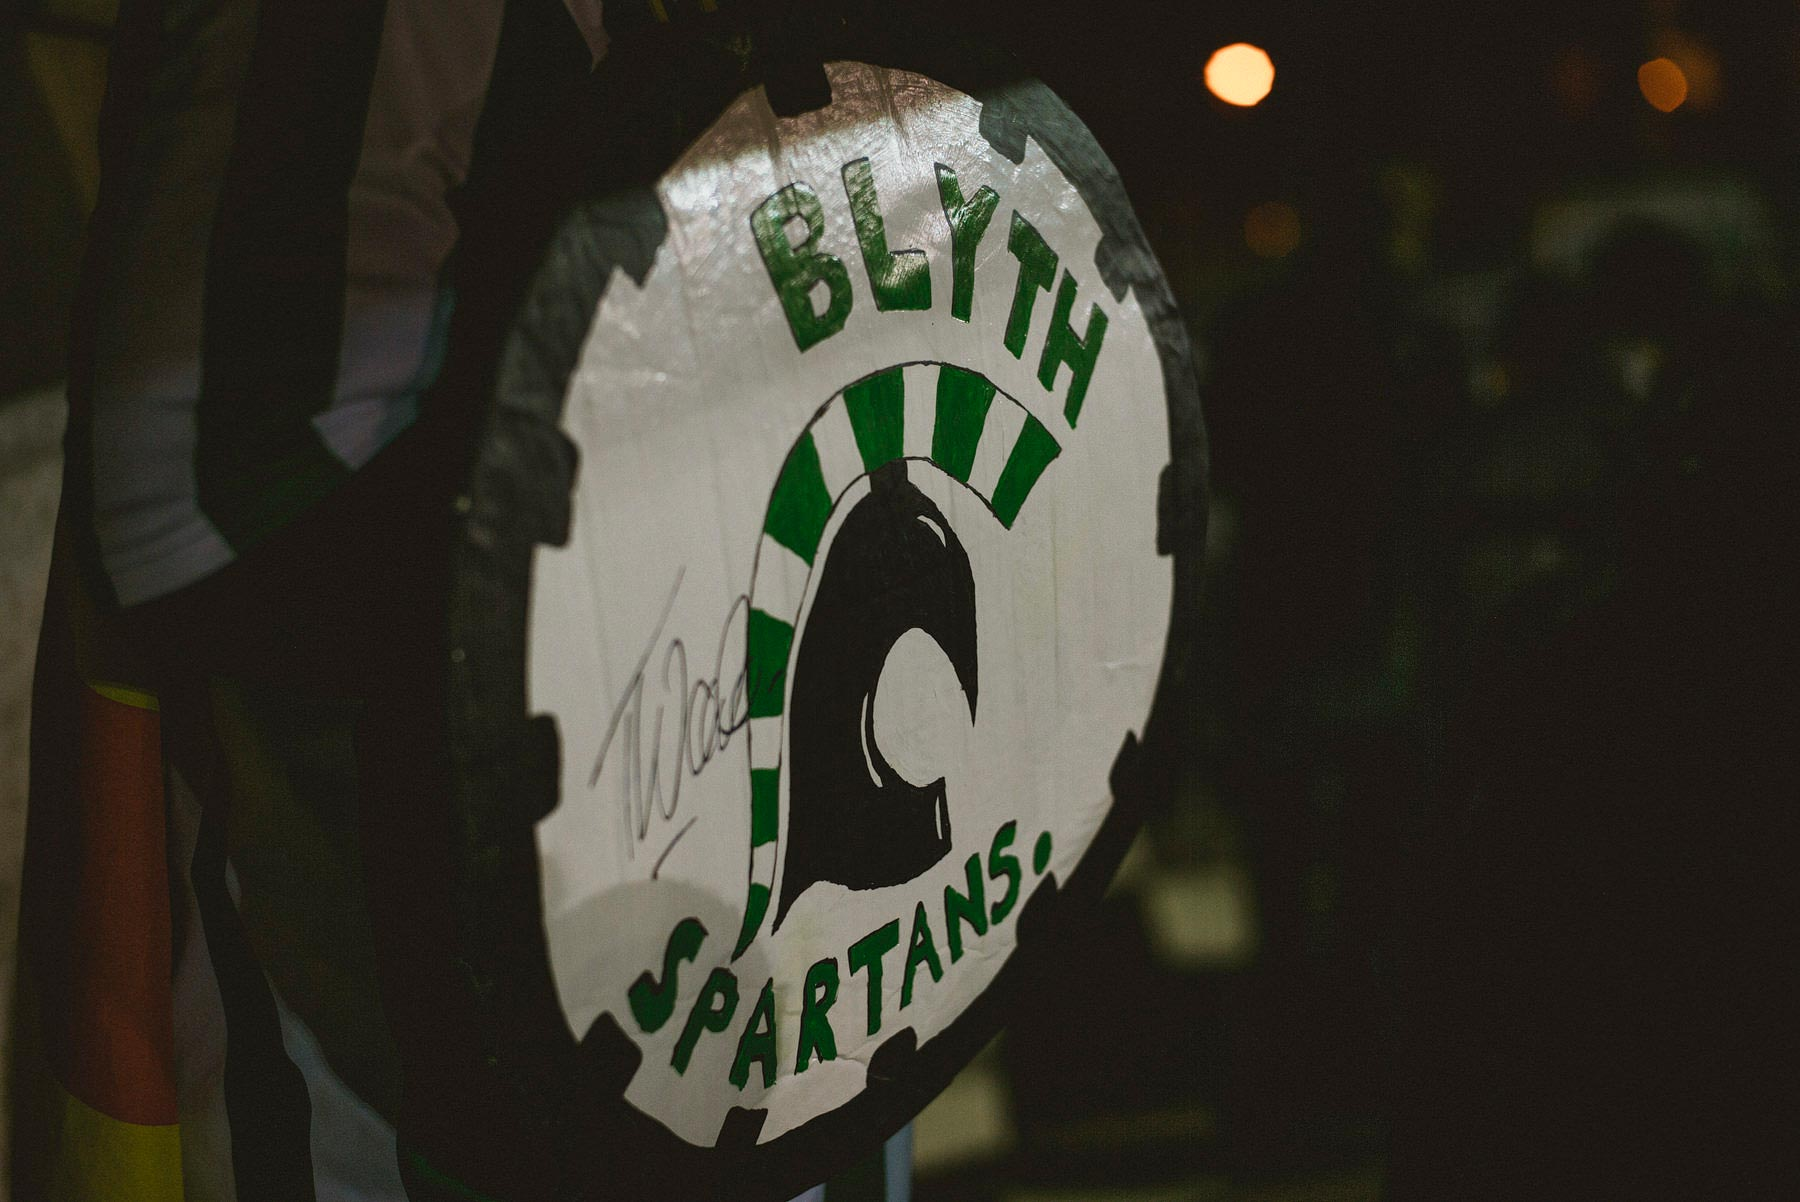 Blyth-Spartans-49